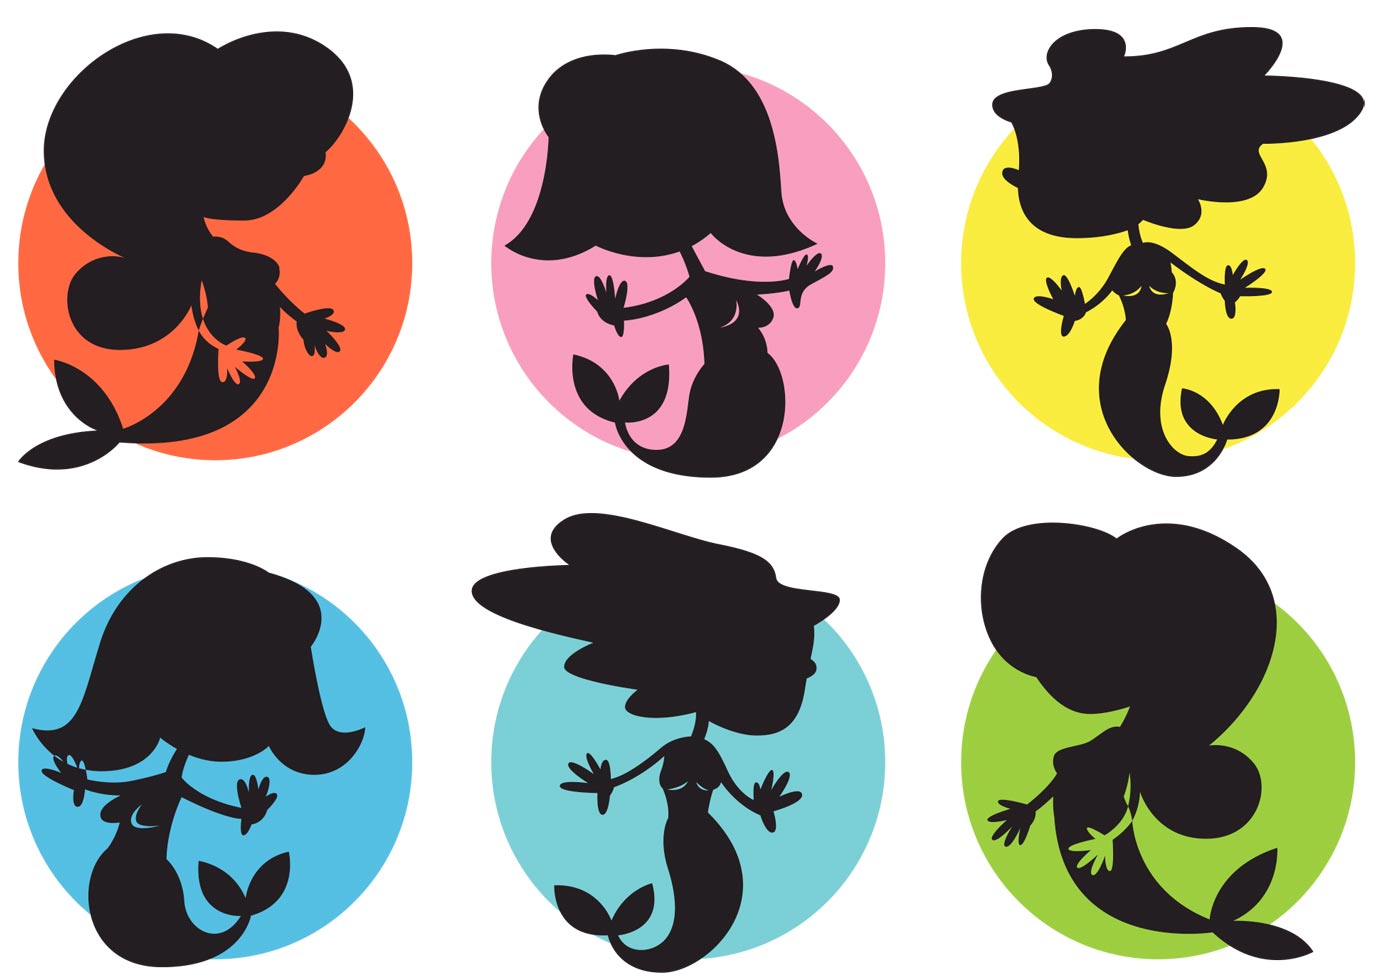 Cartoon Mermaids Vector Silhouettes Illustrations Free - Download Free Vector Art, Stock ...